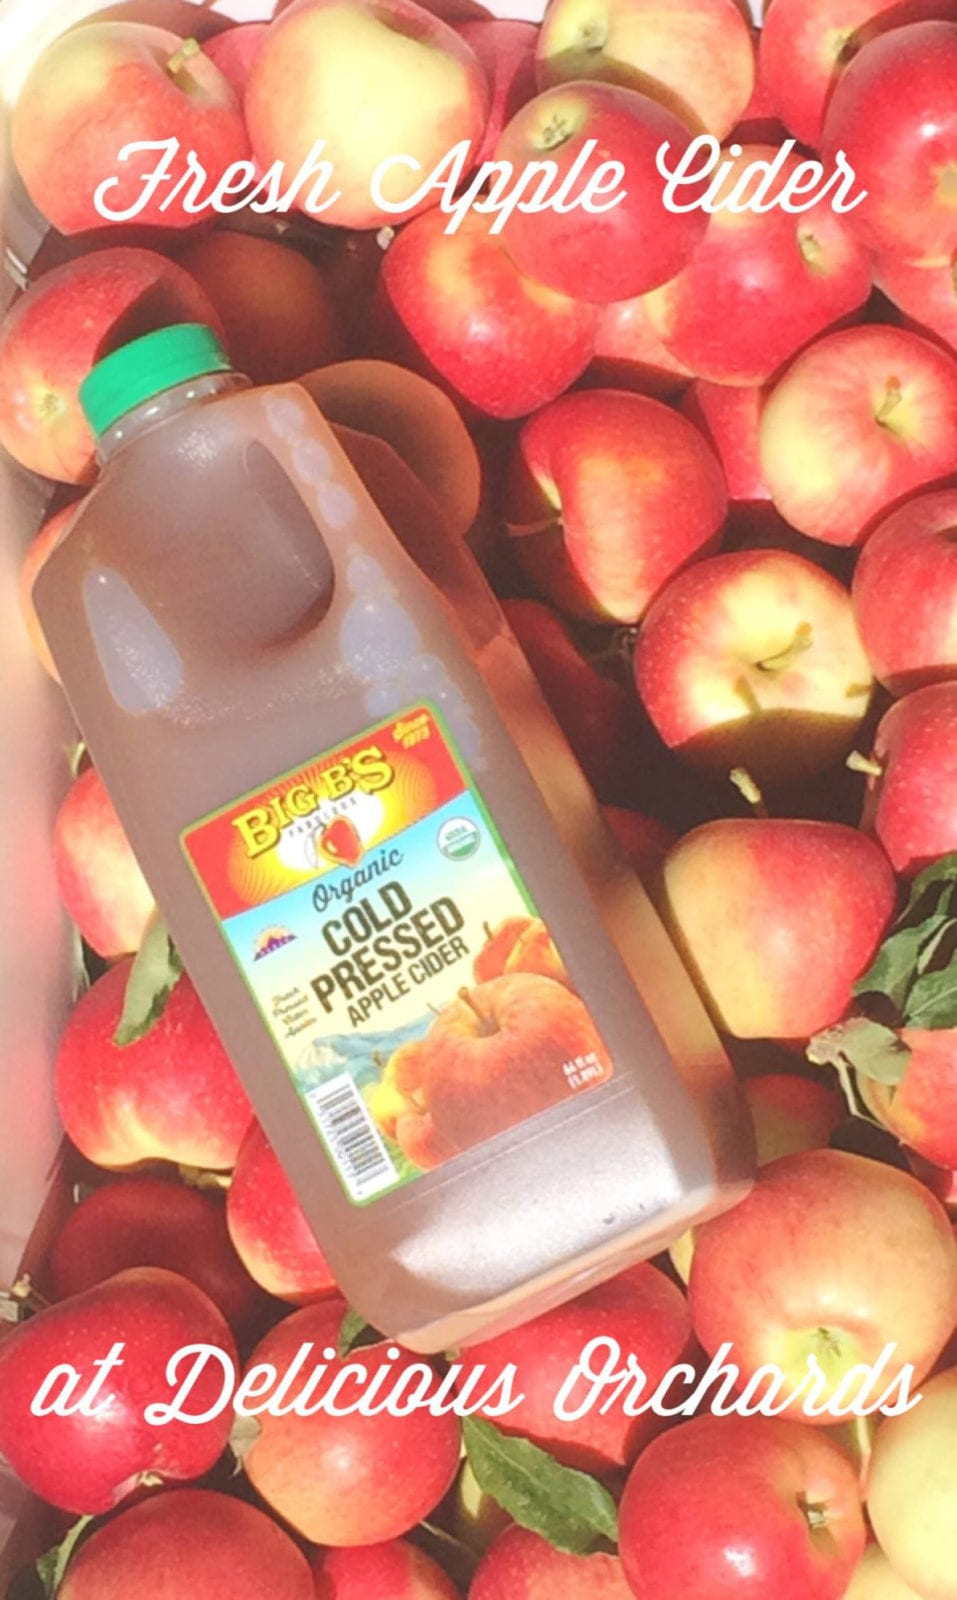 Big B's Juices Apple CIder